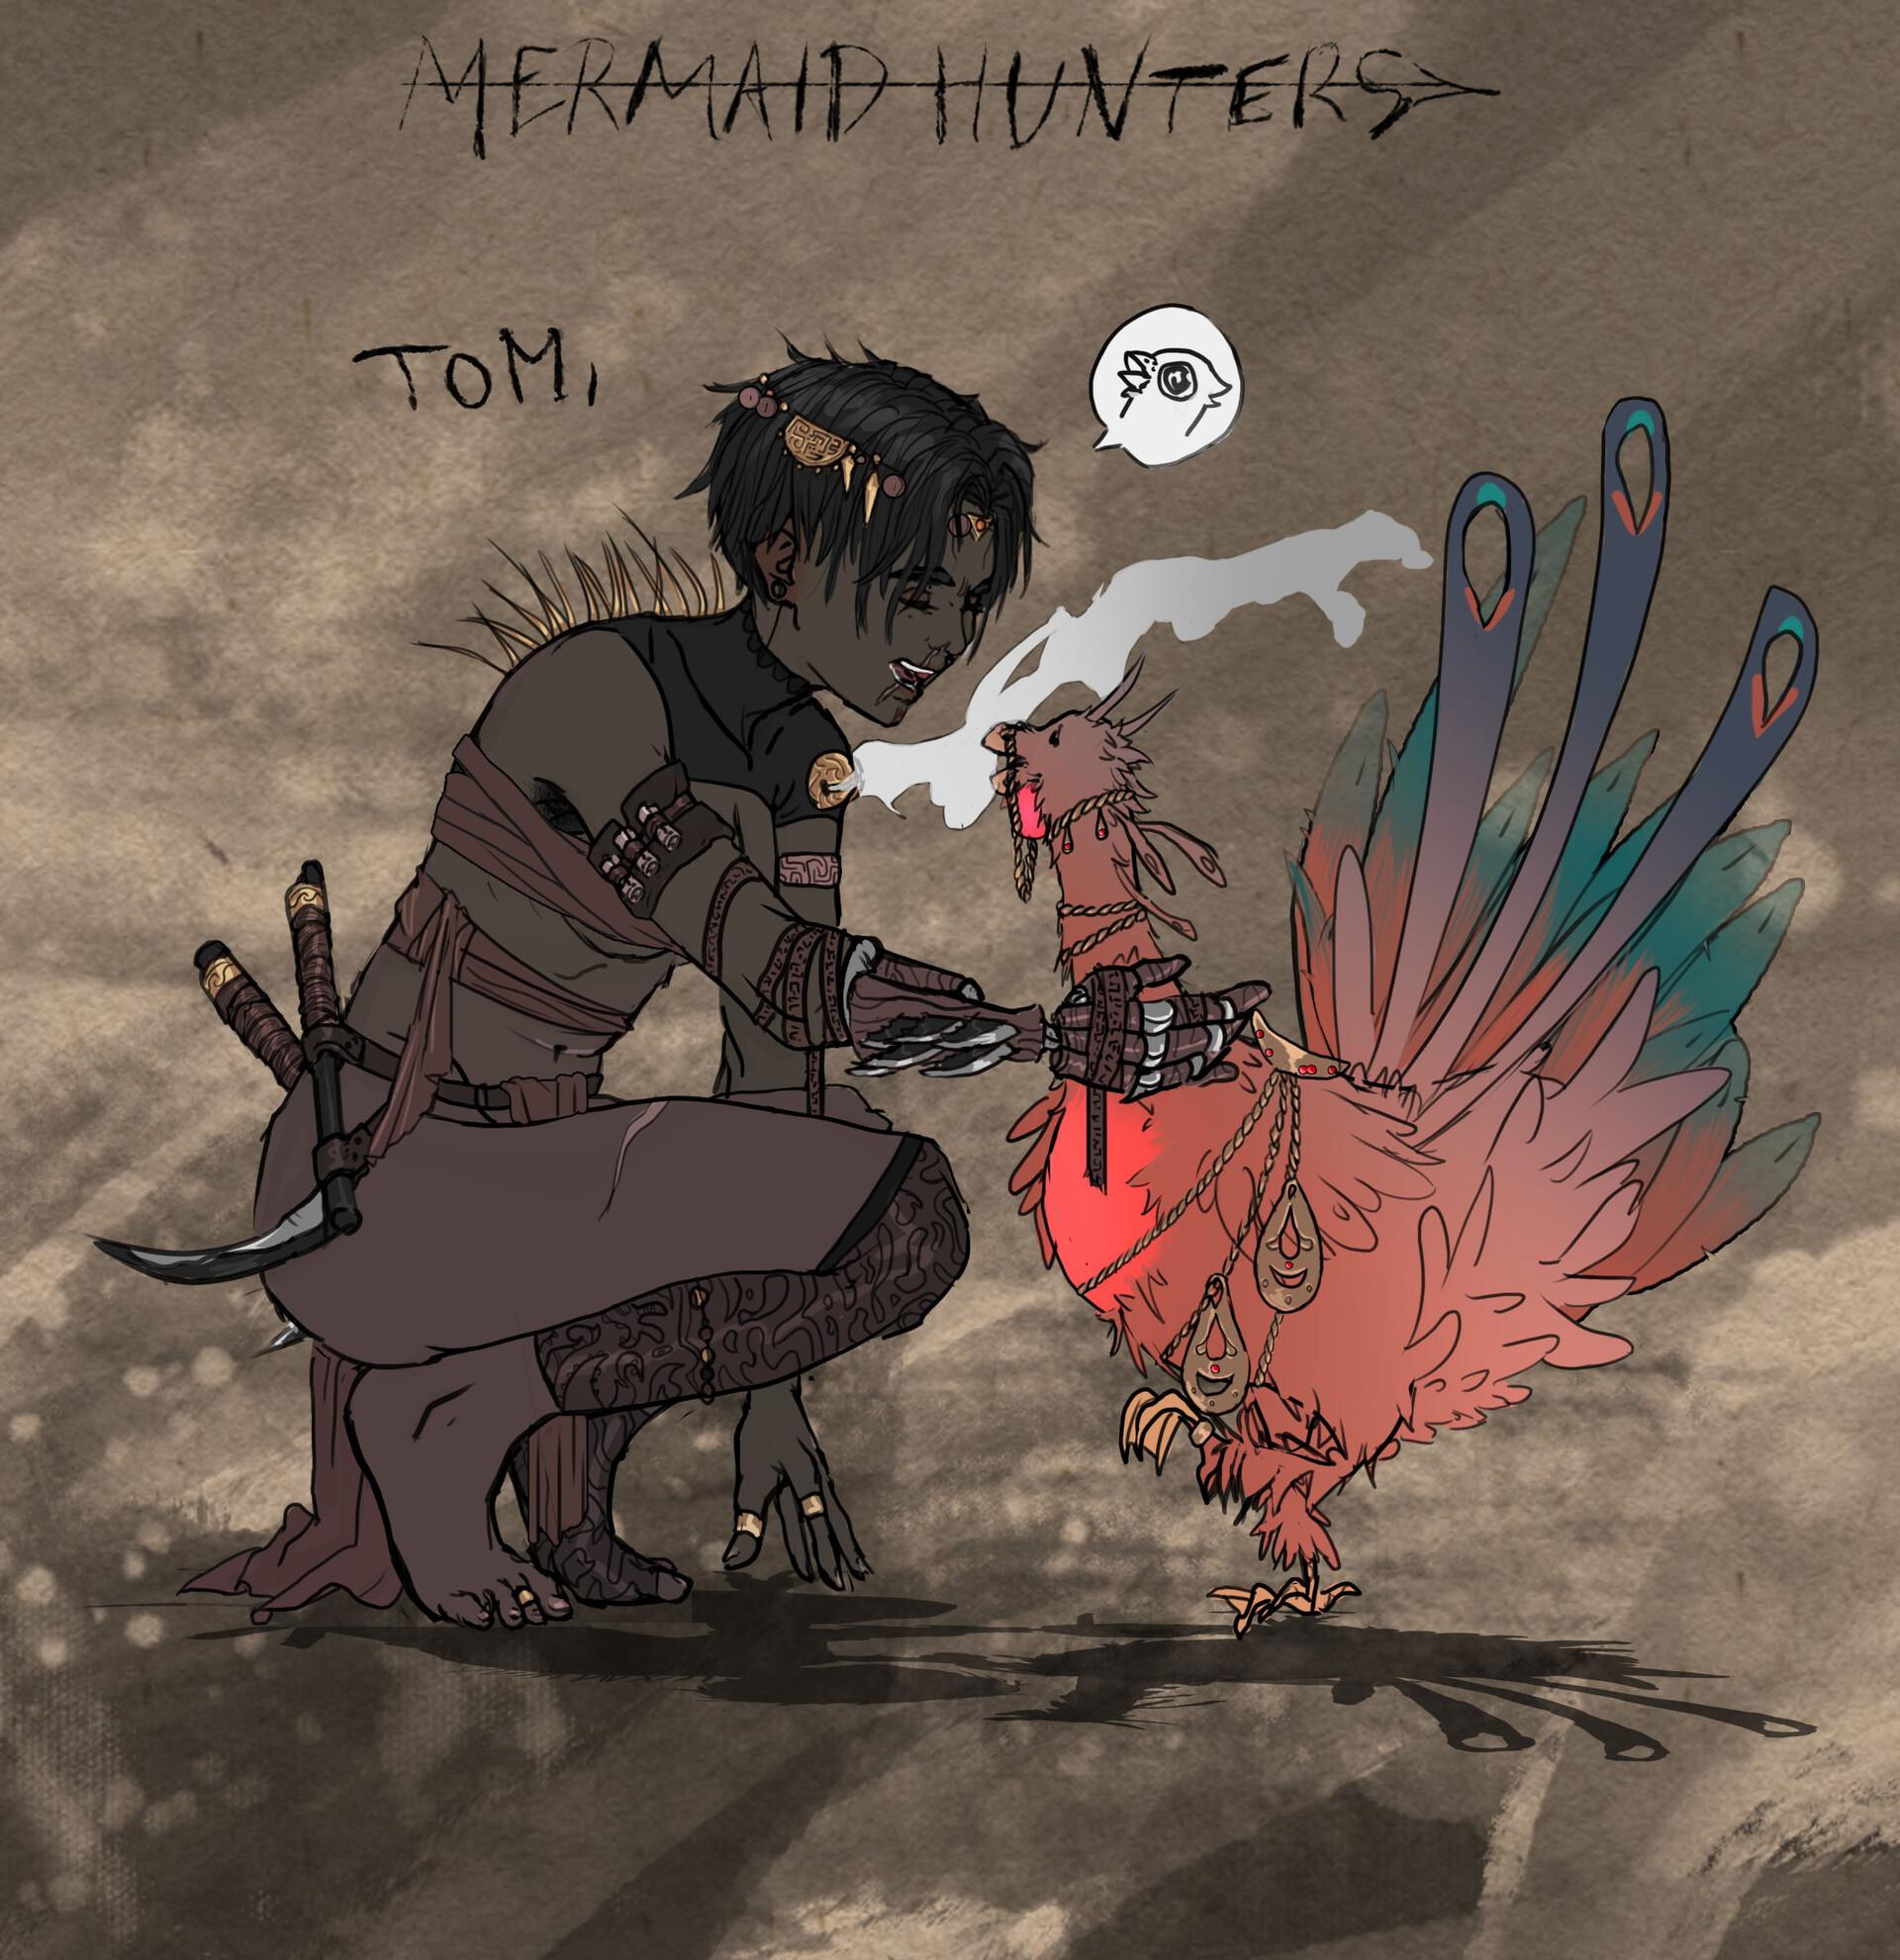 Kurtis knight mermaid hunters tommy04